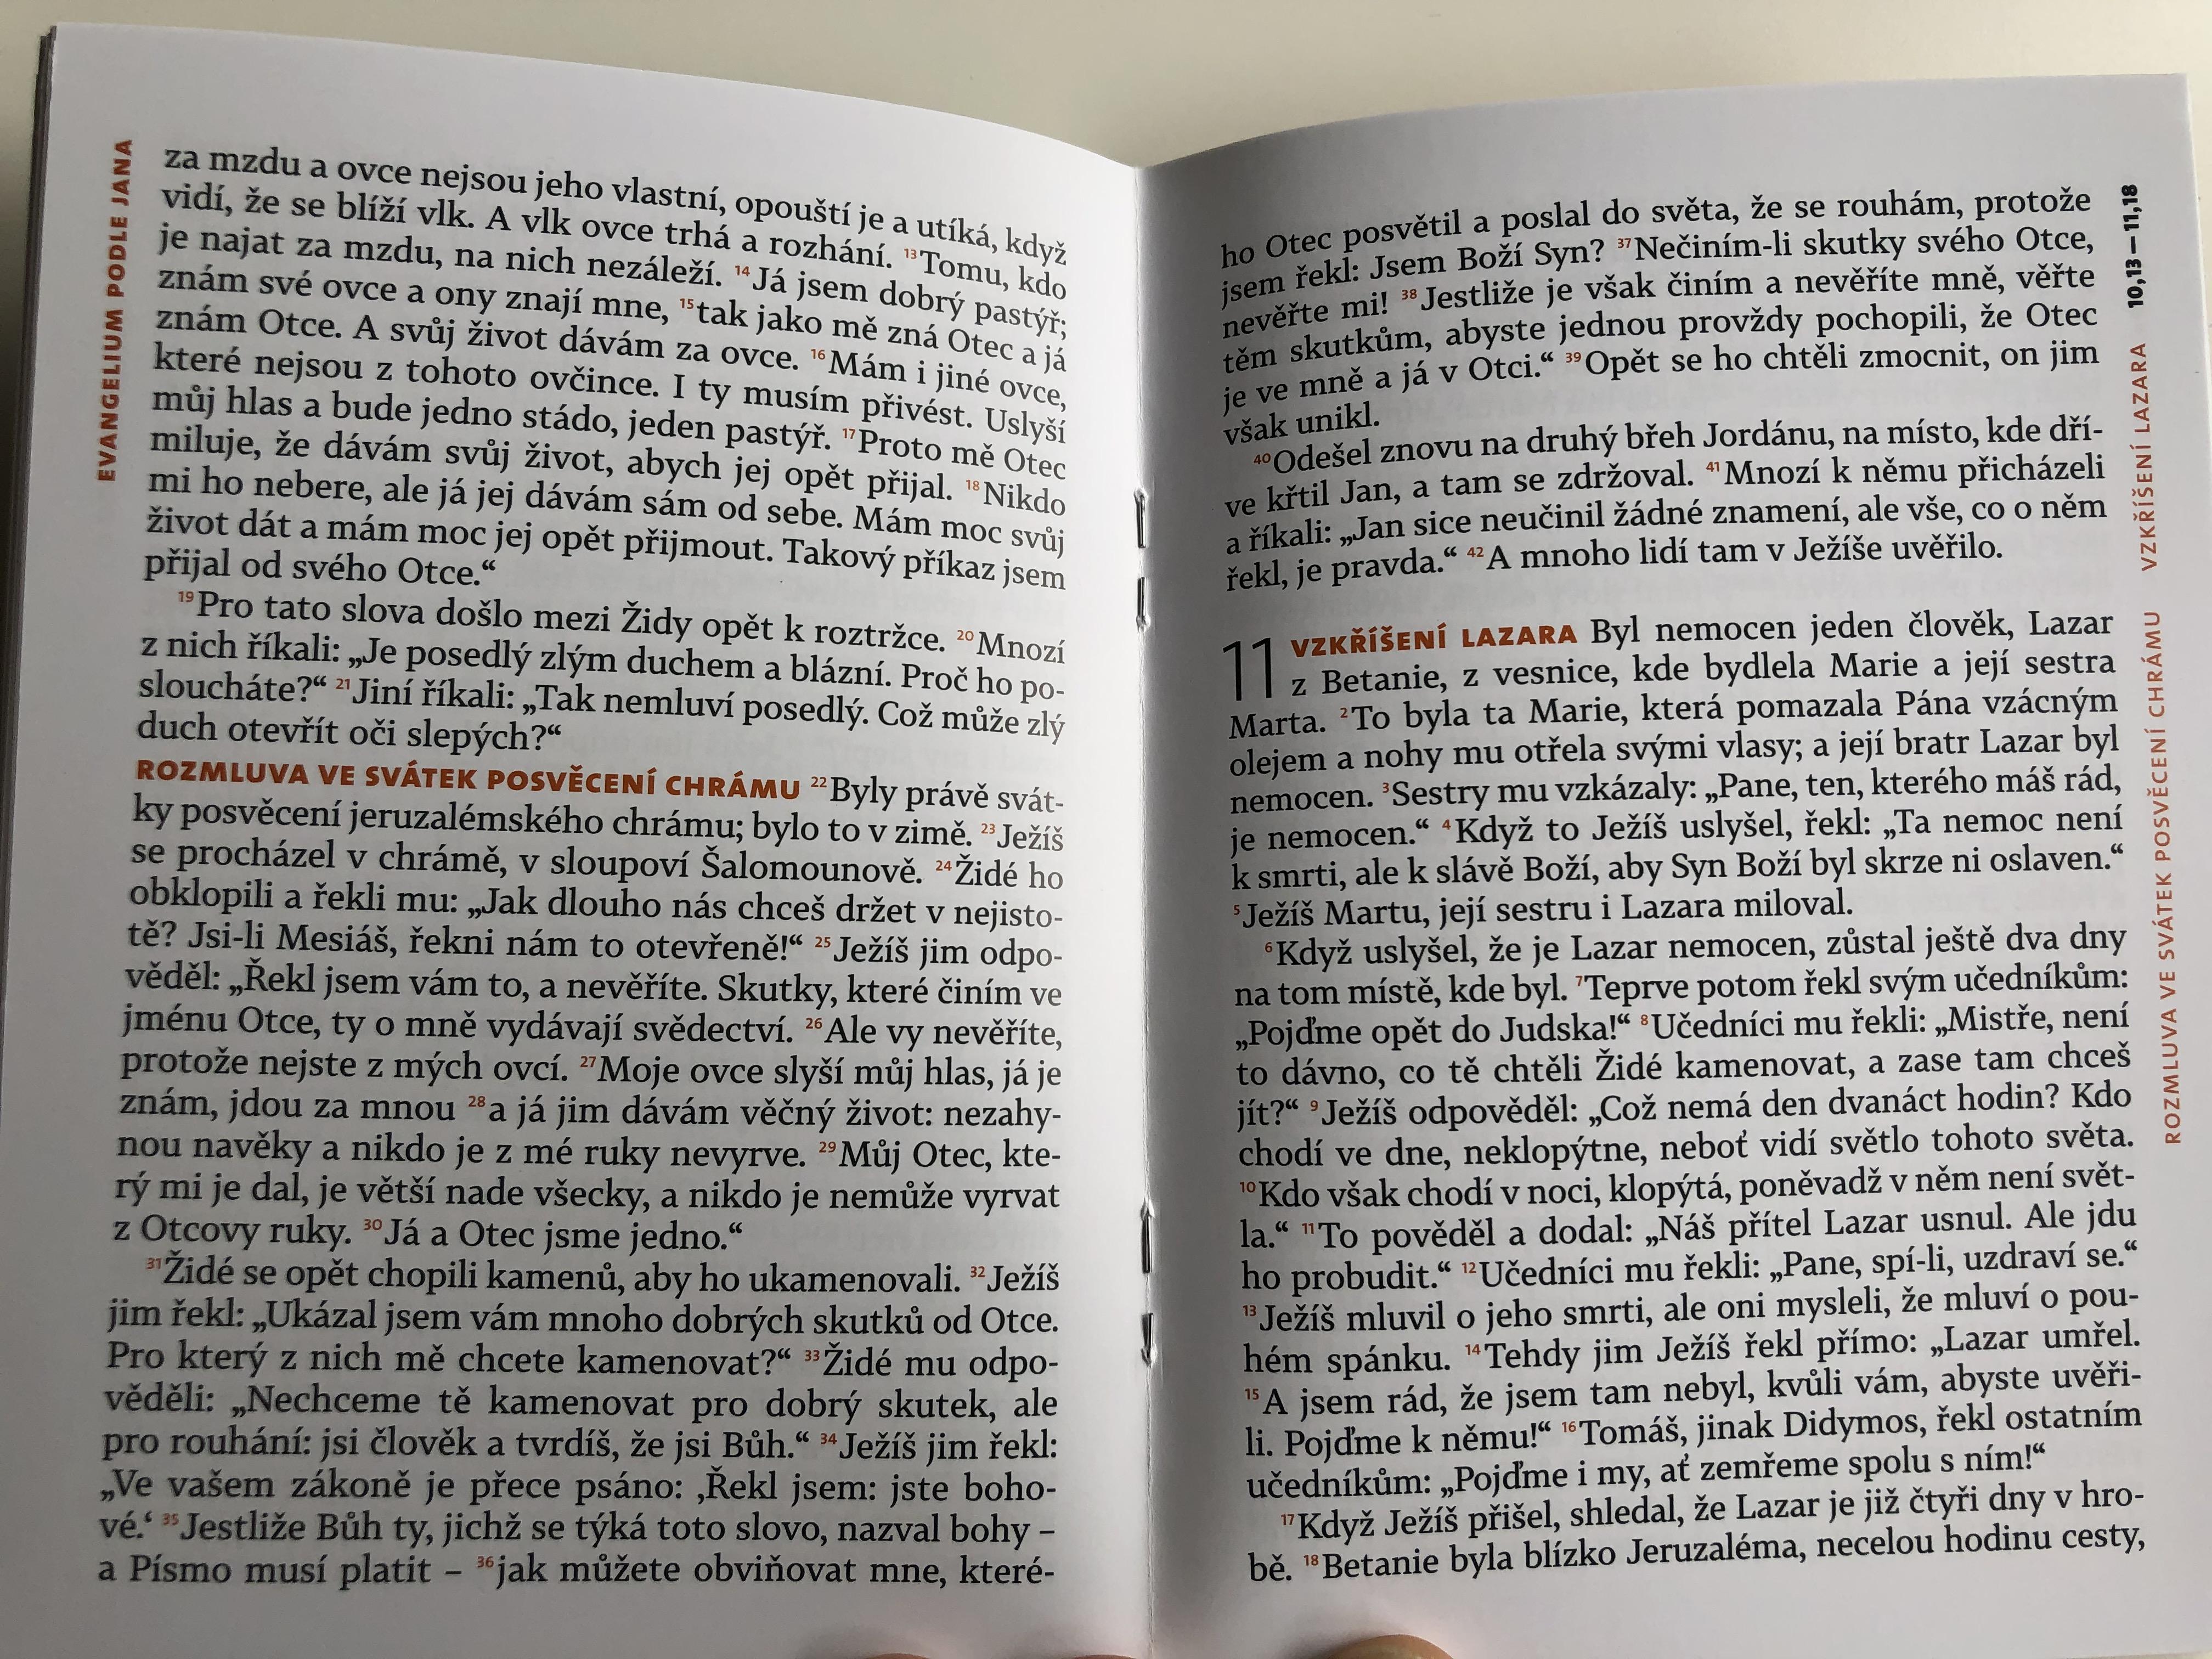 evangelium-podle-jana-czech-language-gospel-according-to-john-4.jpg